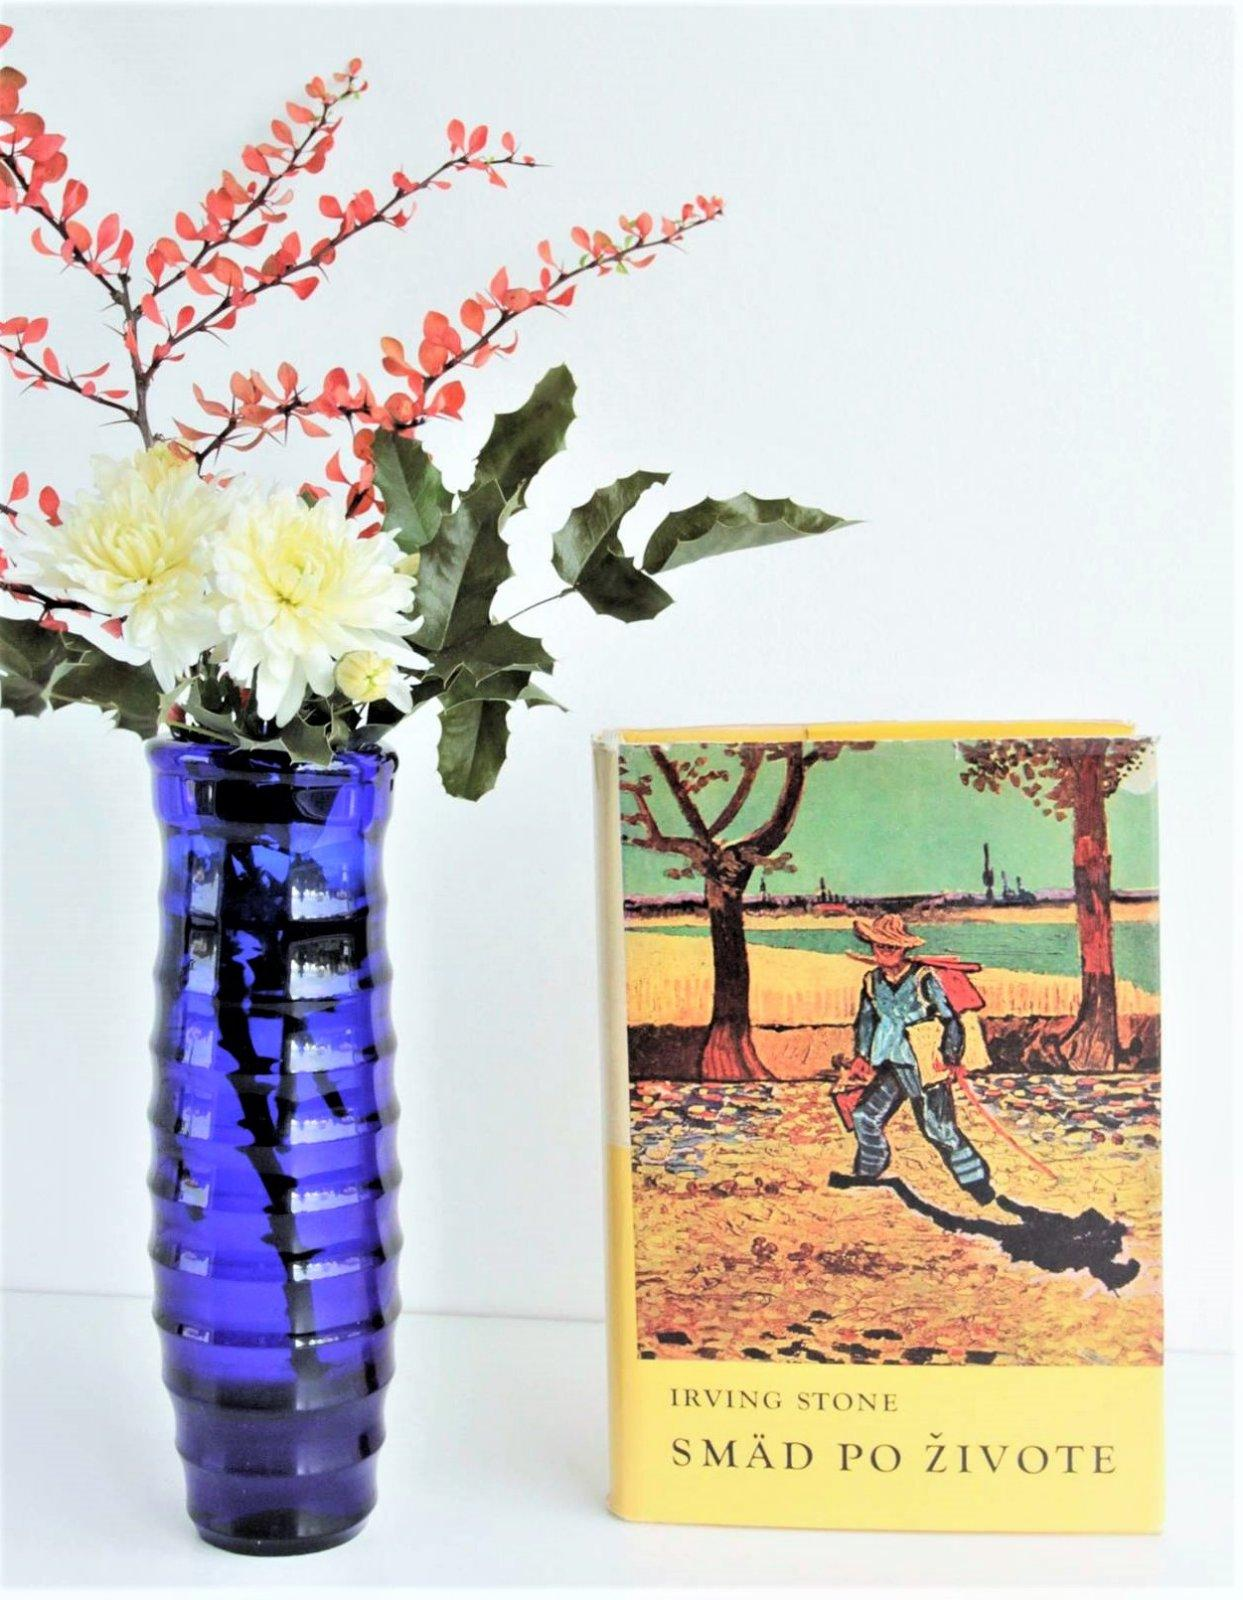 Irving Stone Smäd Po živote Vincent Van Gogh 5 € Od